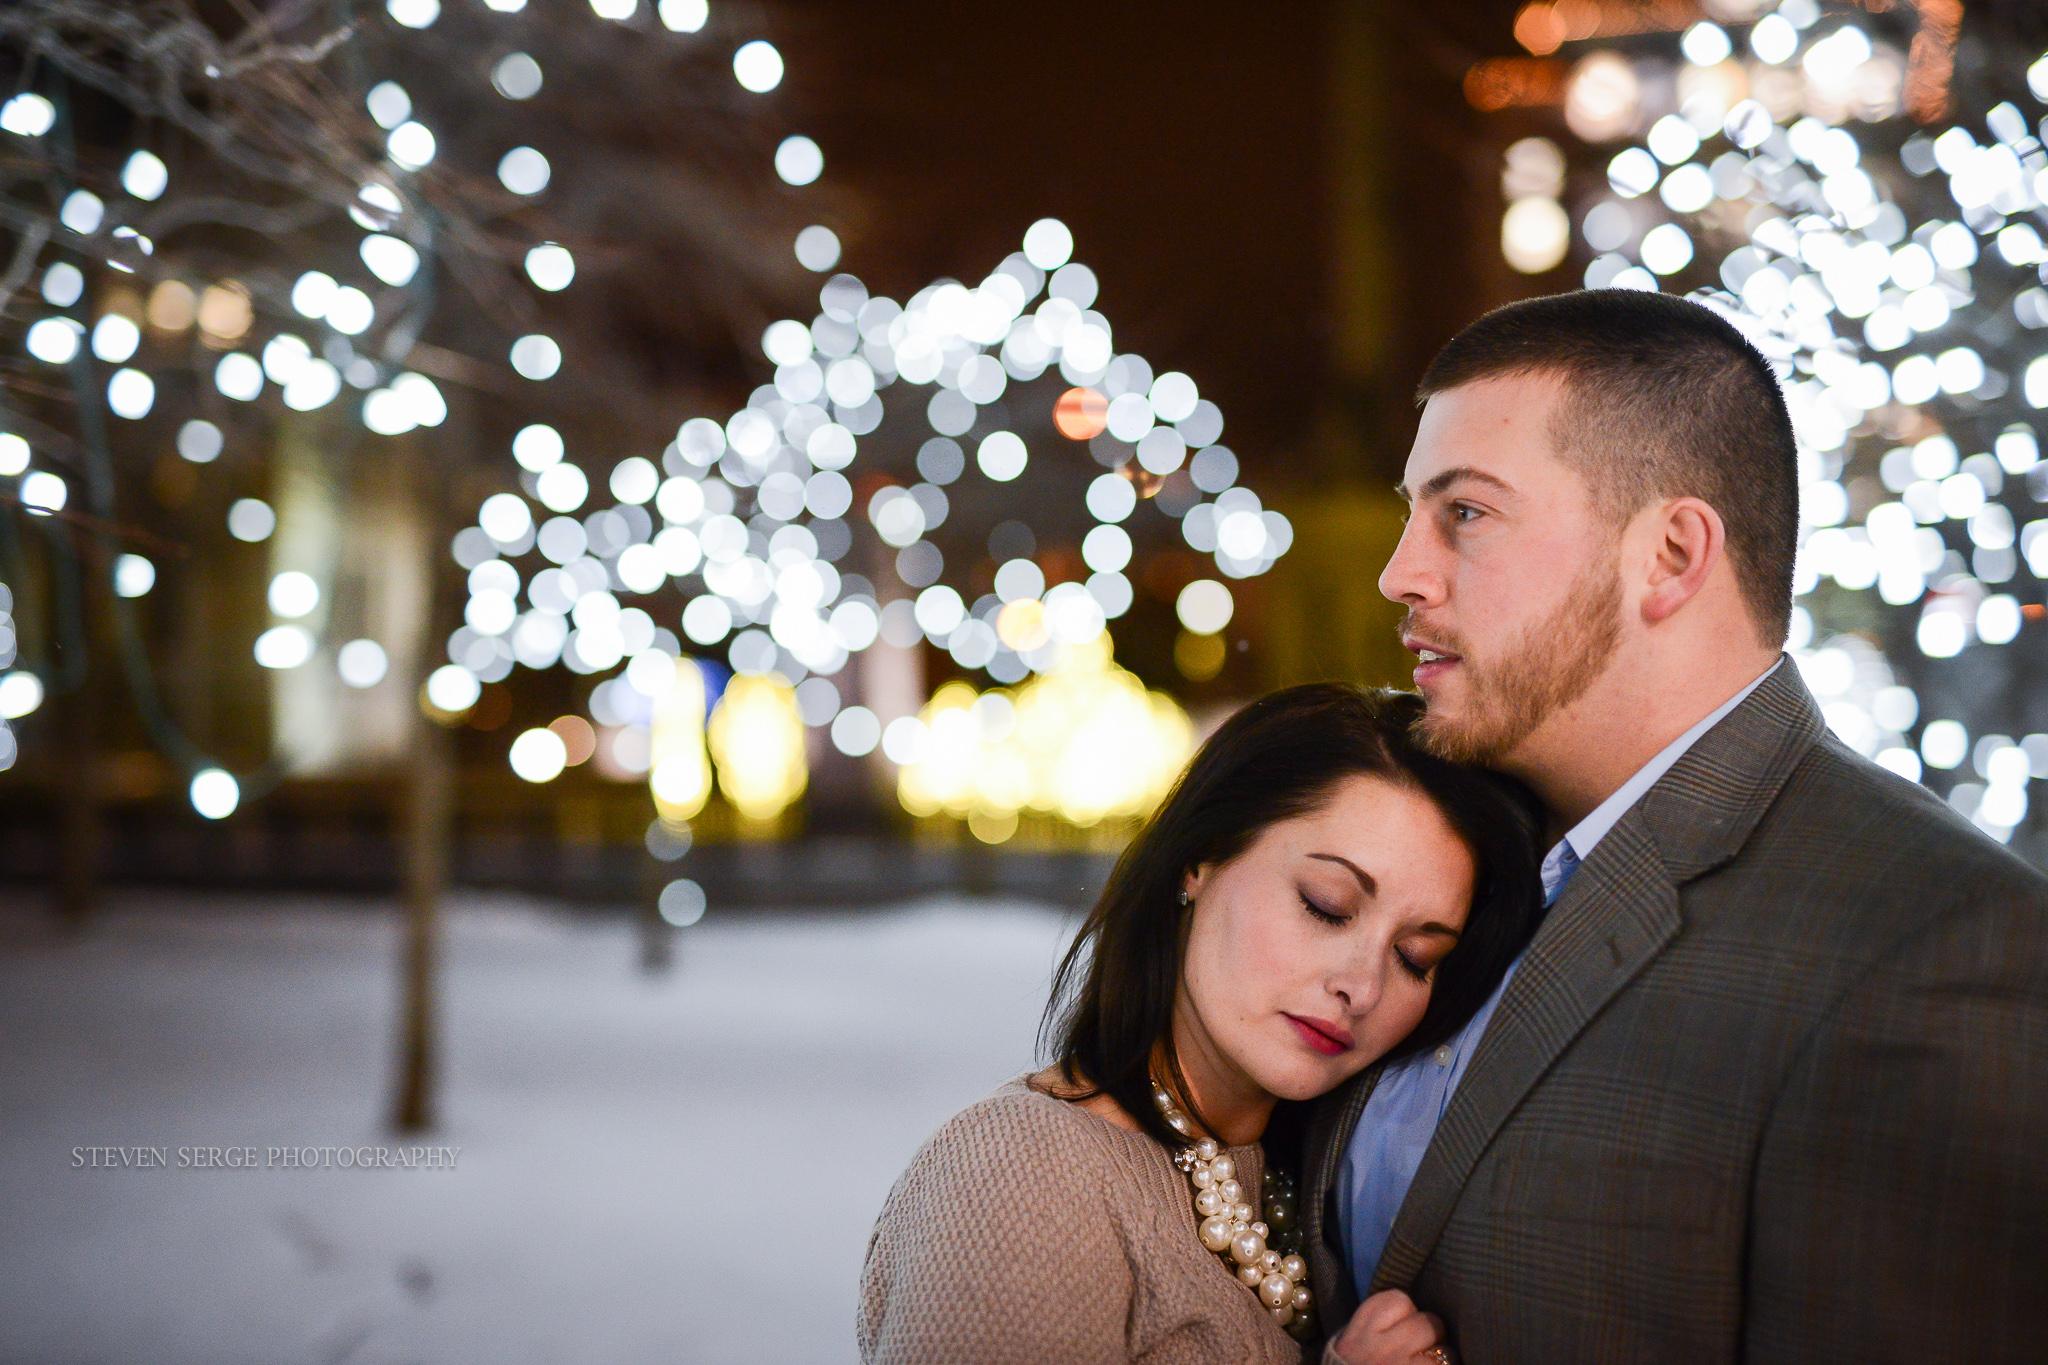 Lindsey-Cultural-Center-Scranton-Engagement-Wedding-Nepa-Photographer-Steamtown-Photography-5.jpg